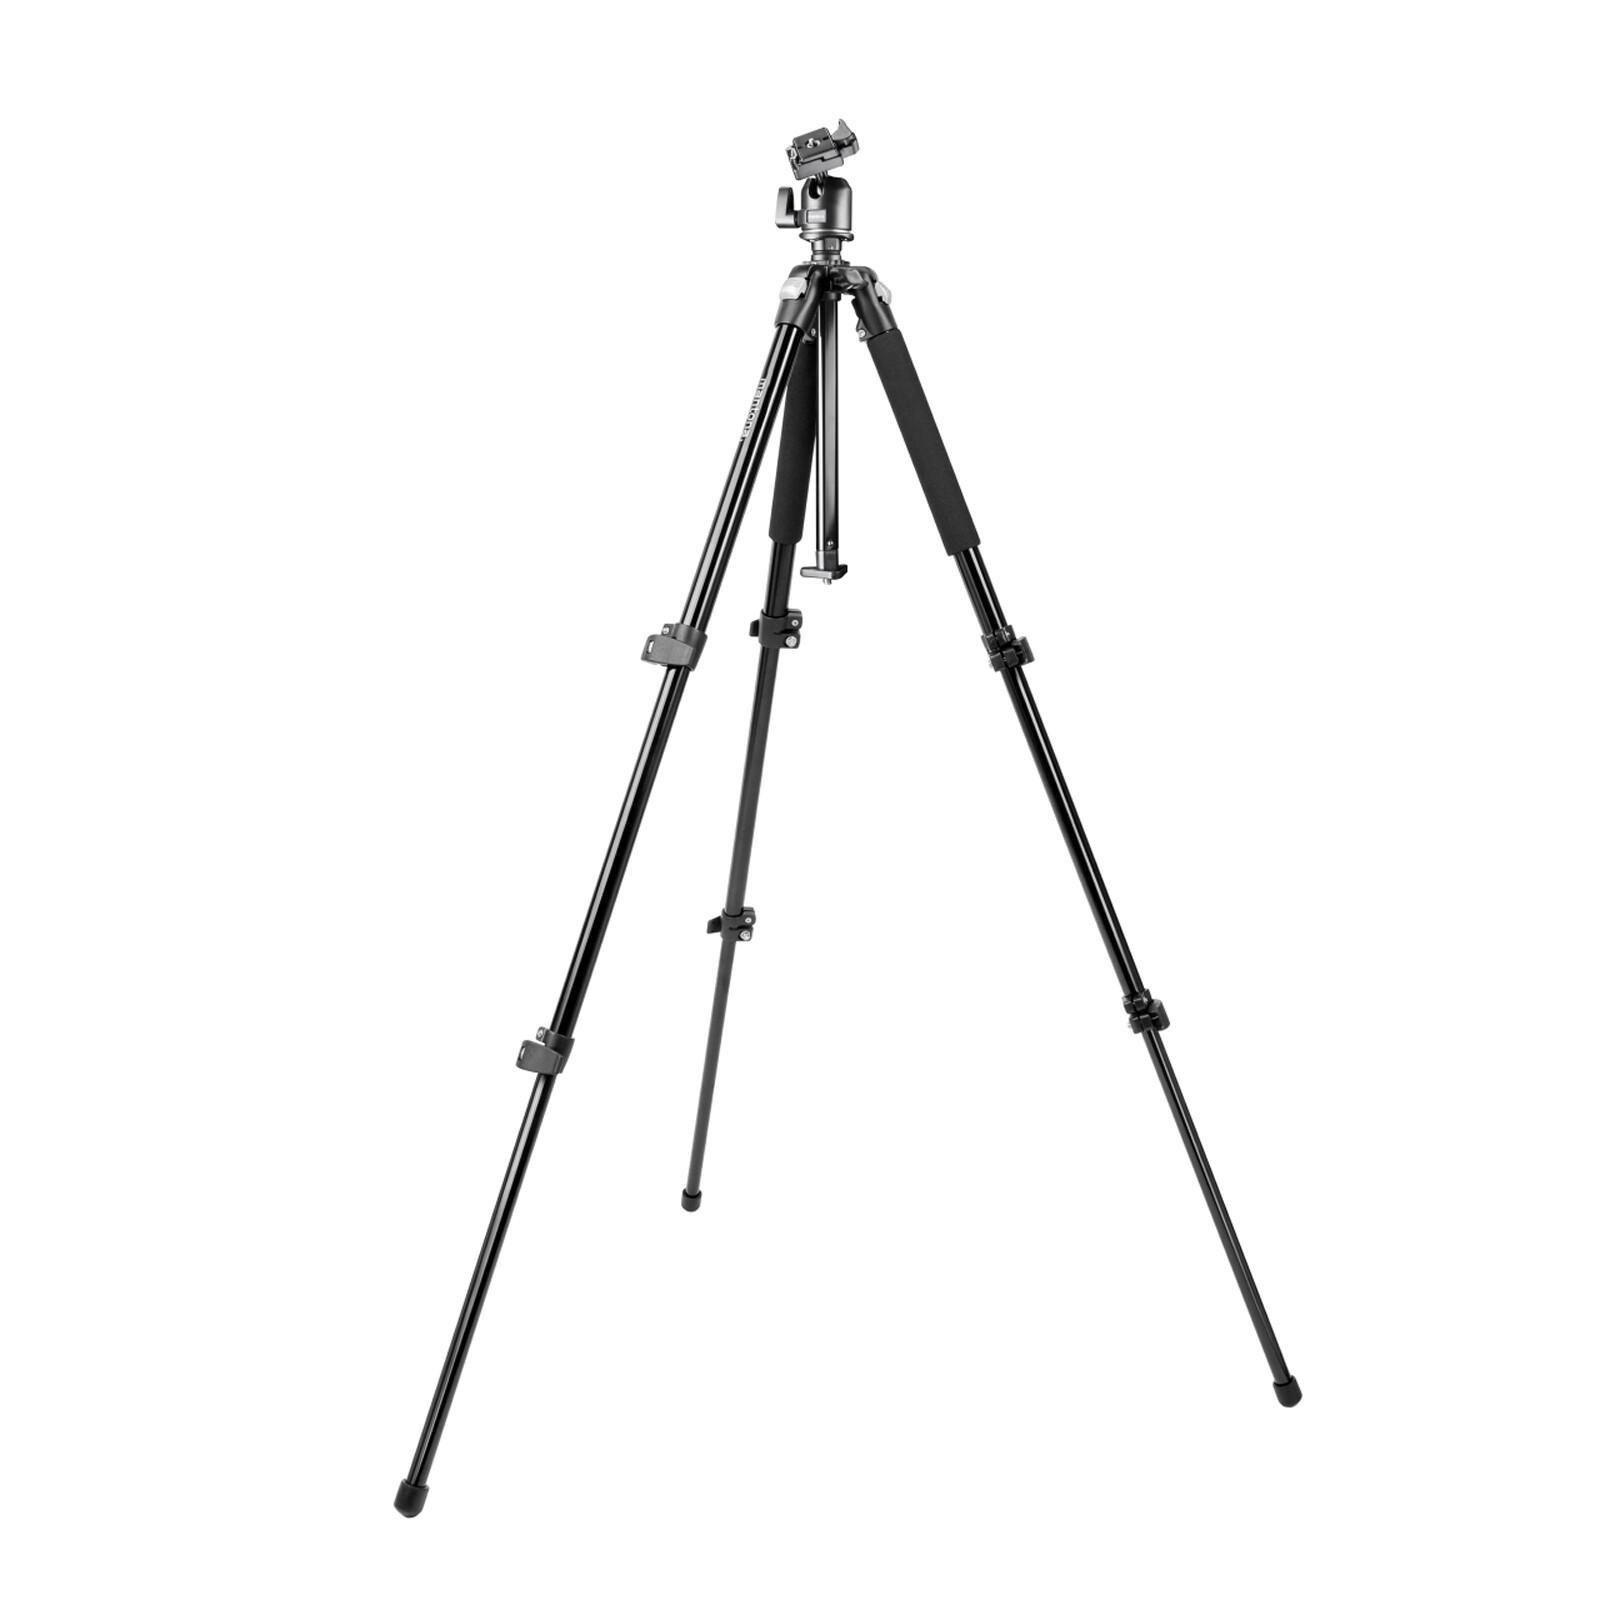 Mantona Pro Makro II Stativ mit Kugelkopf, 151cm